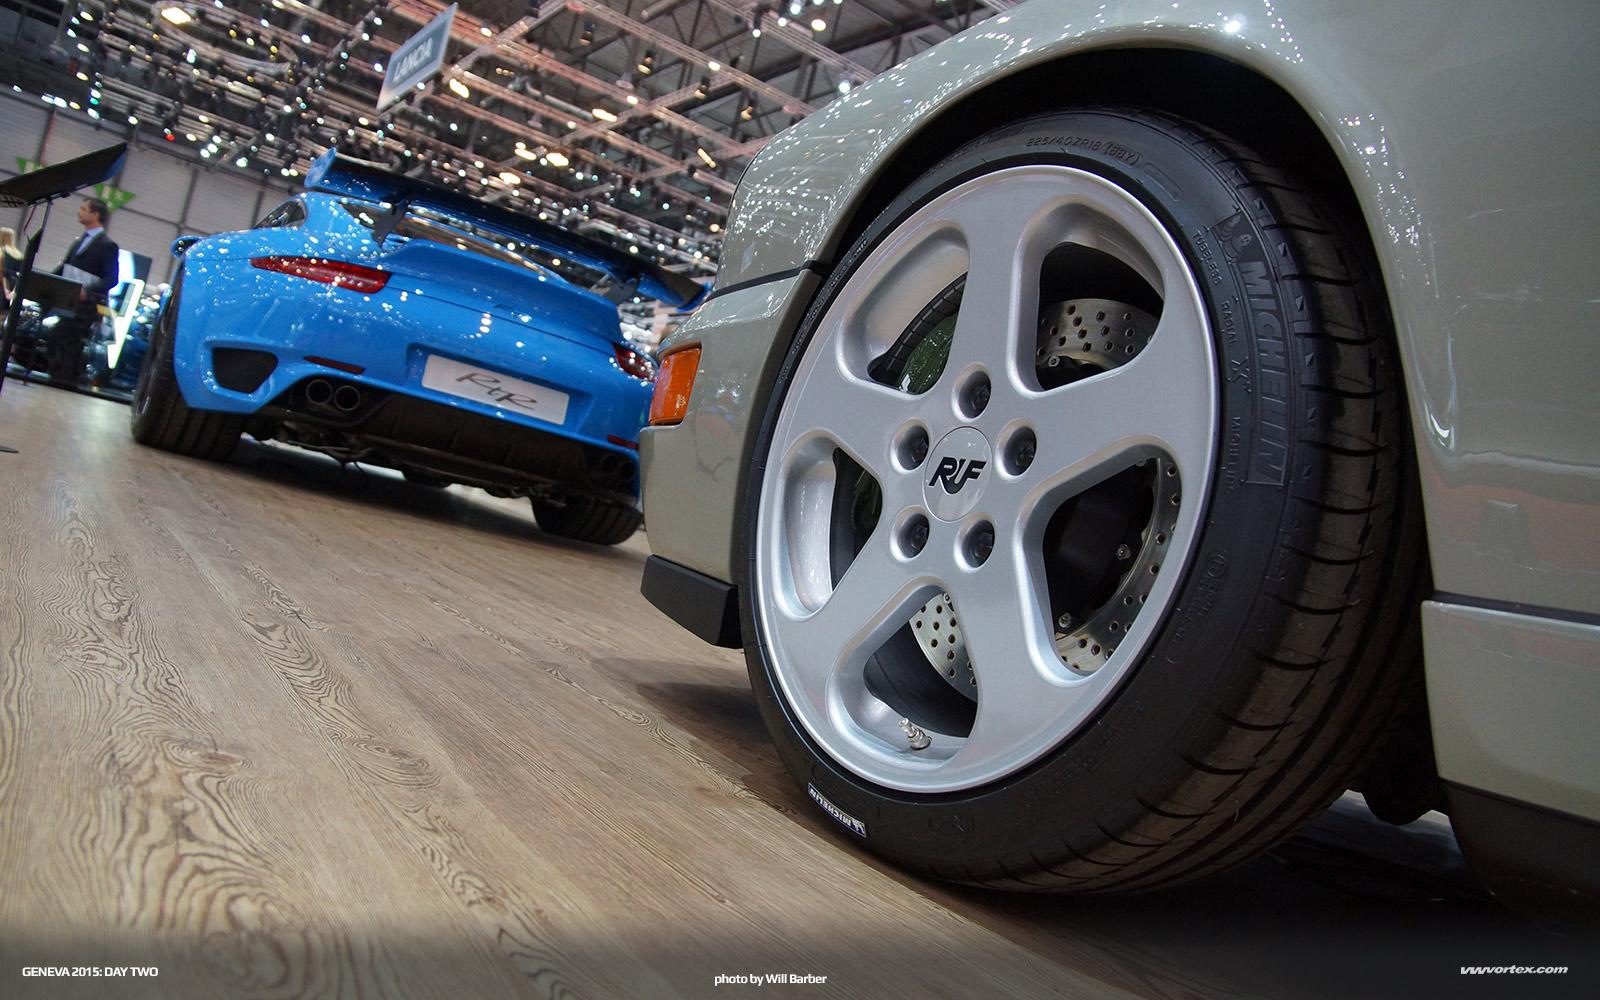 Geneva-2015-Day-Two-Volkswagen-Group-811